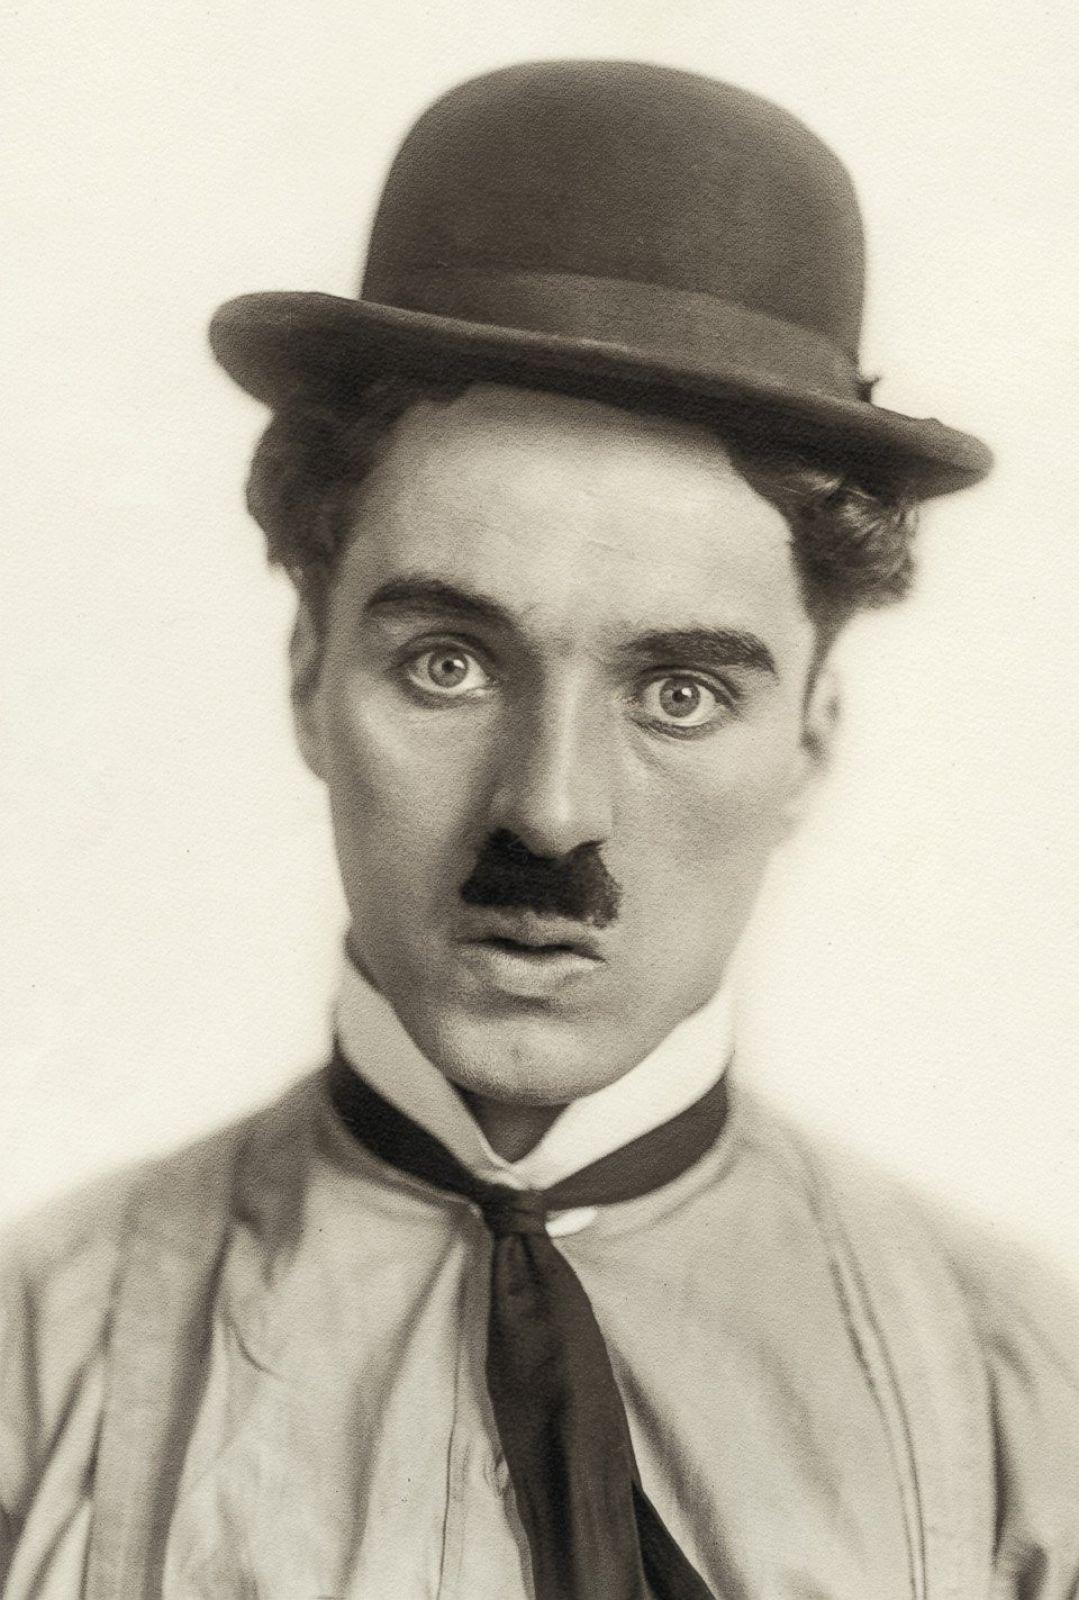 Charlie Chaplin film Modern Times Essay